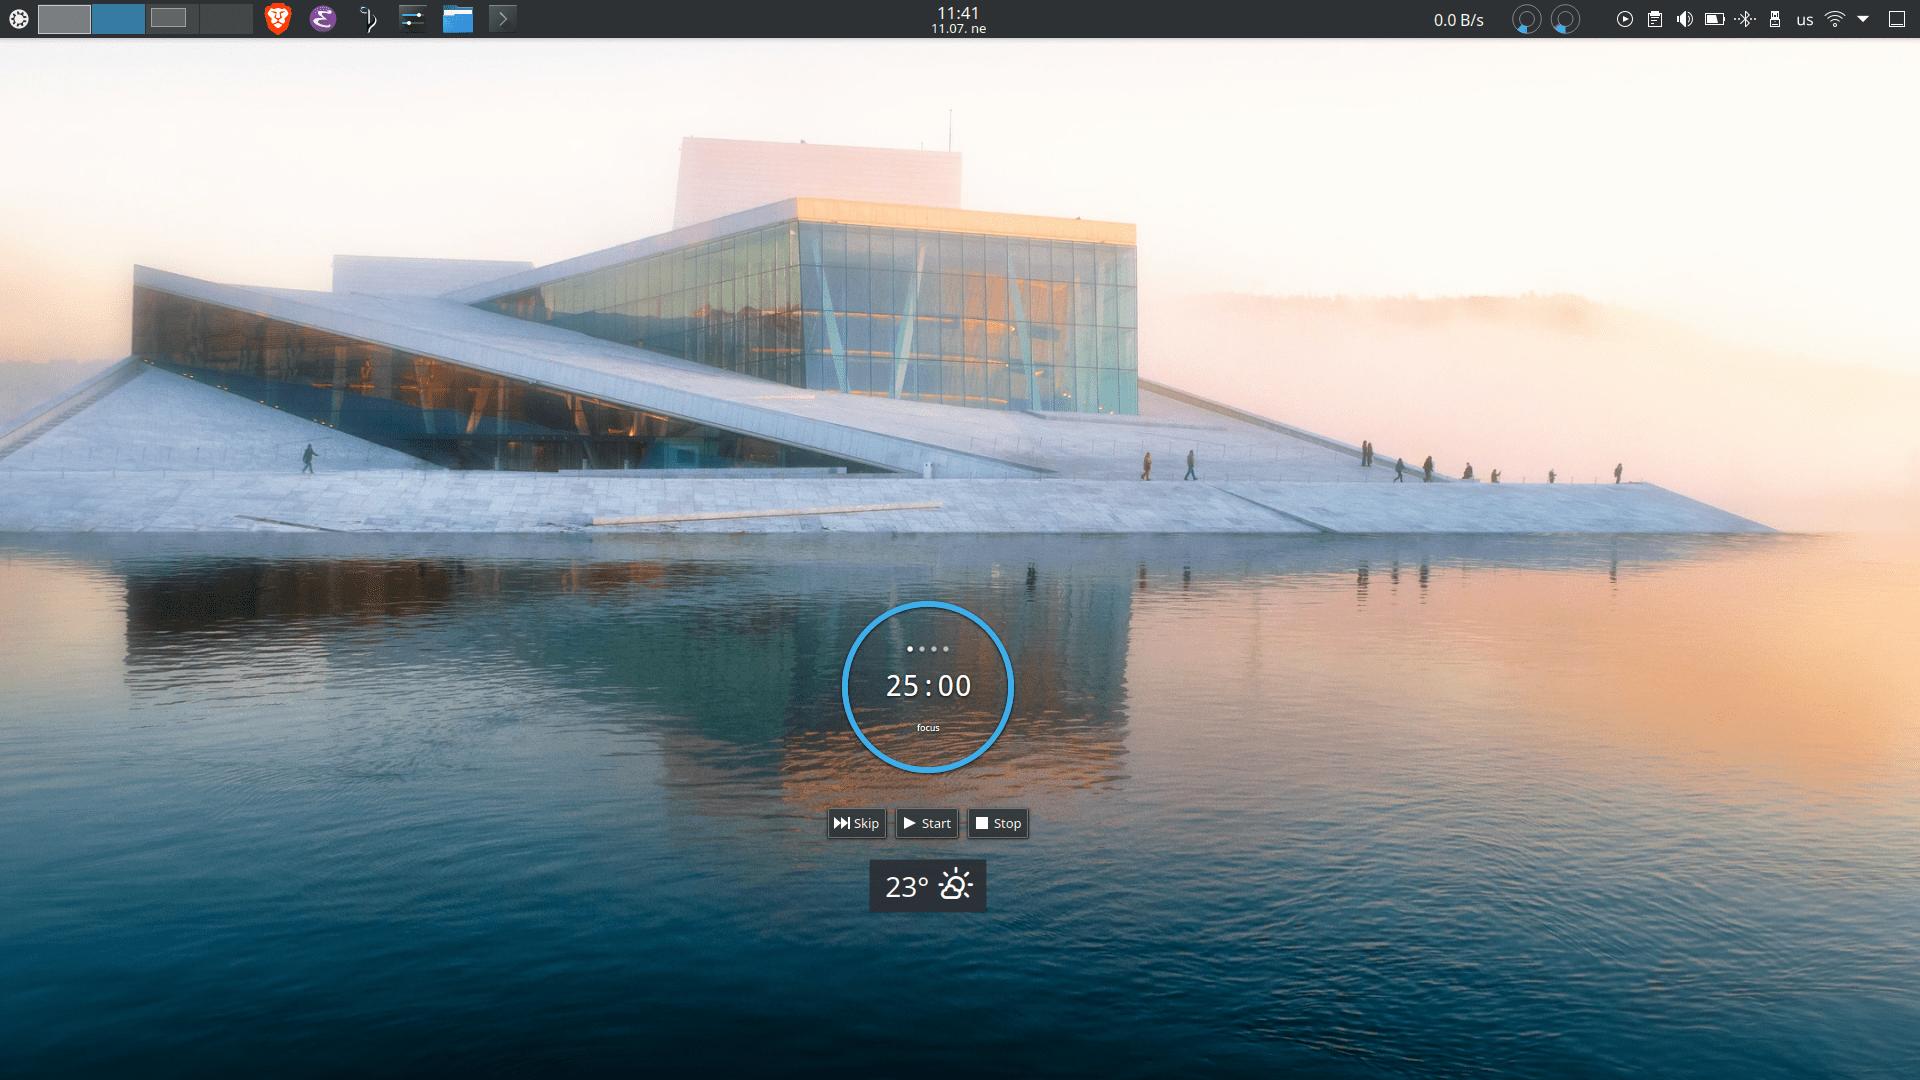 My desktop with Plasma